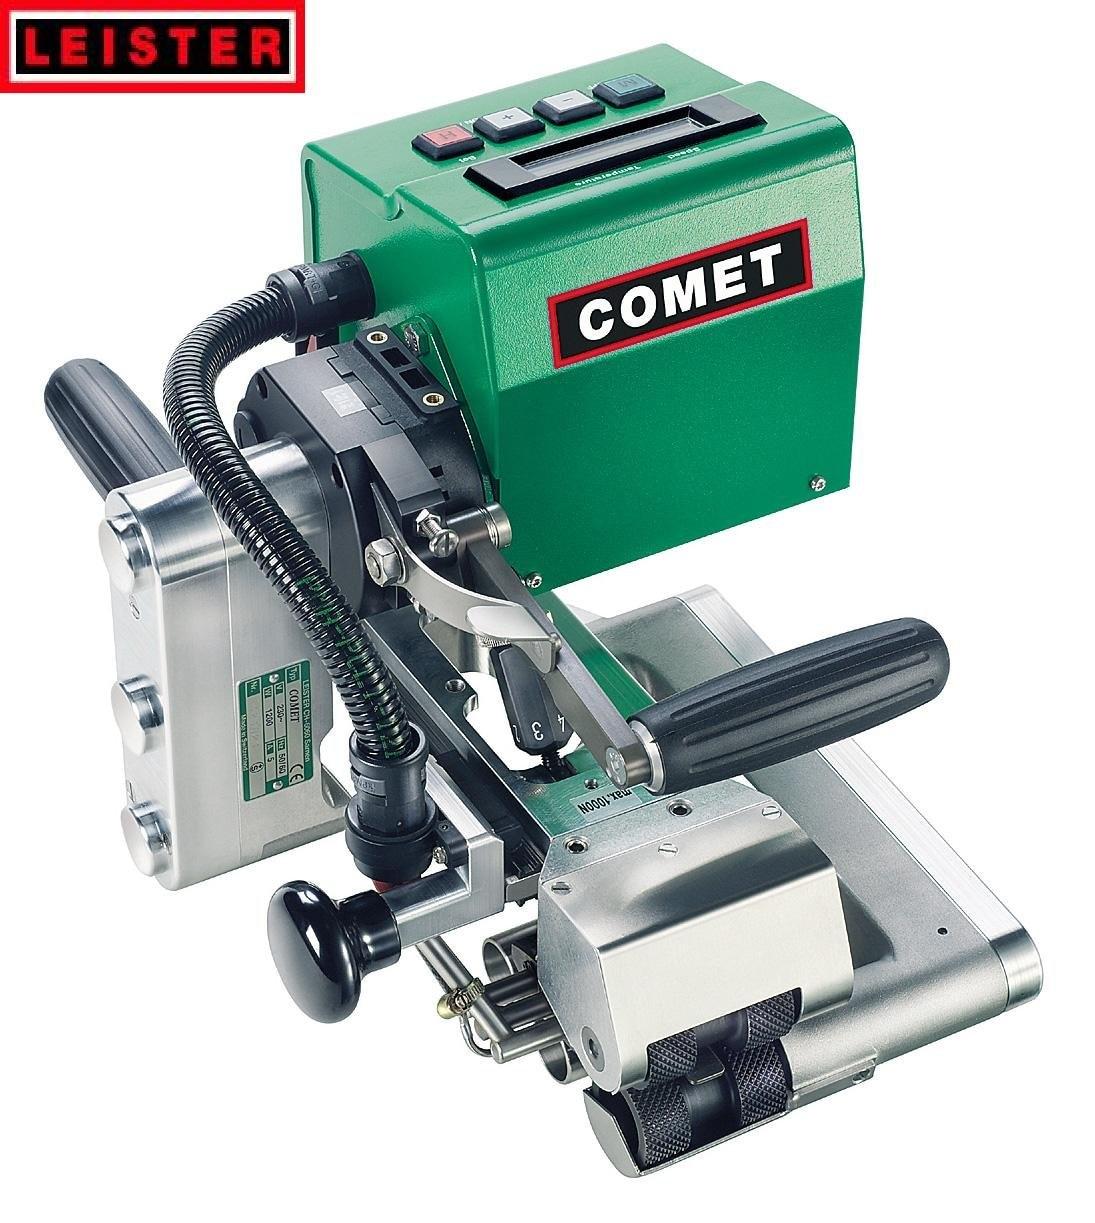 hight resolution of leister plastic welding machine comet